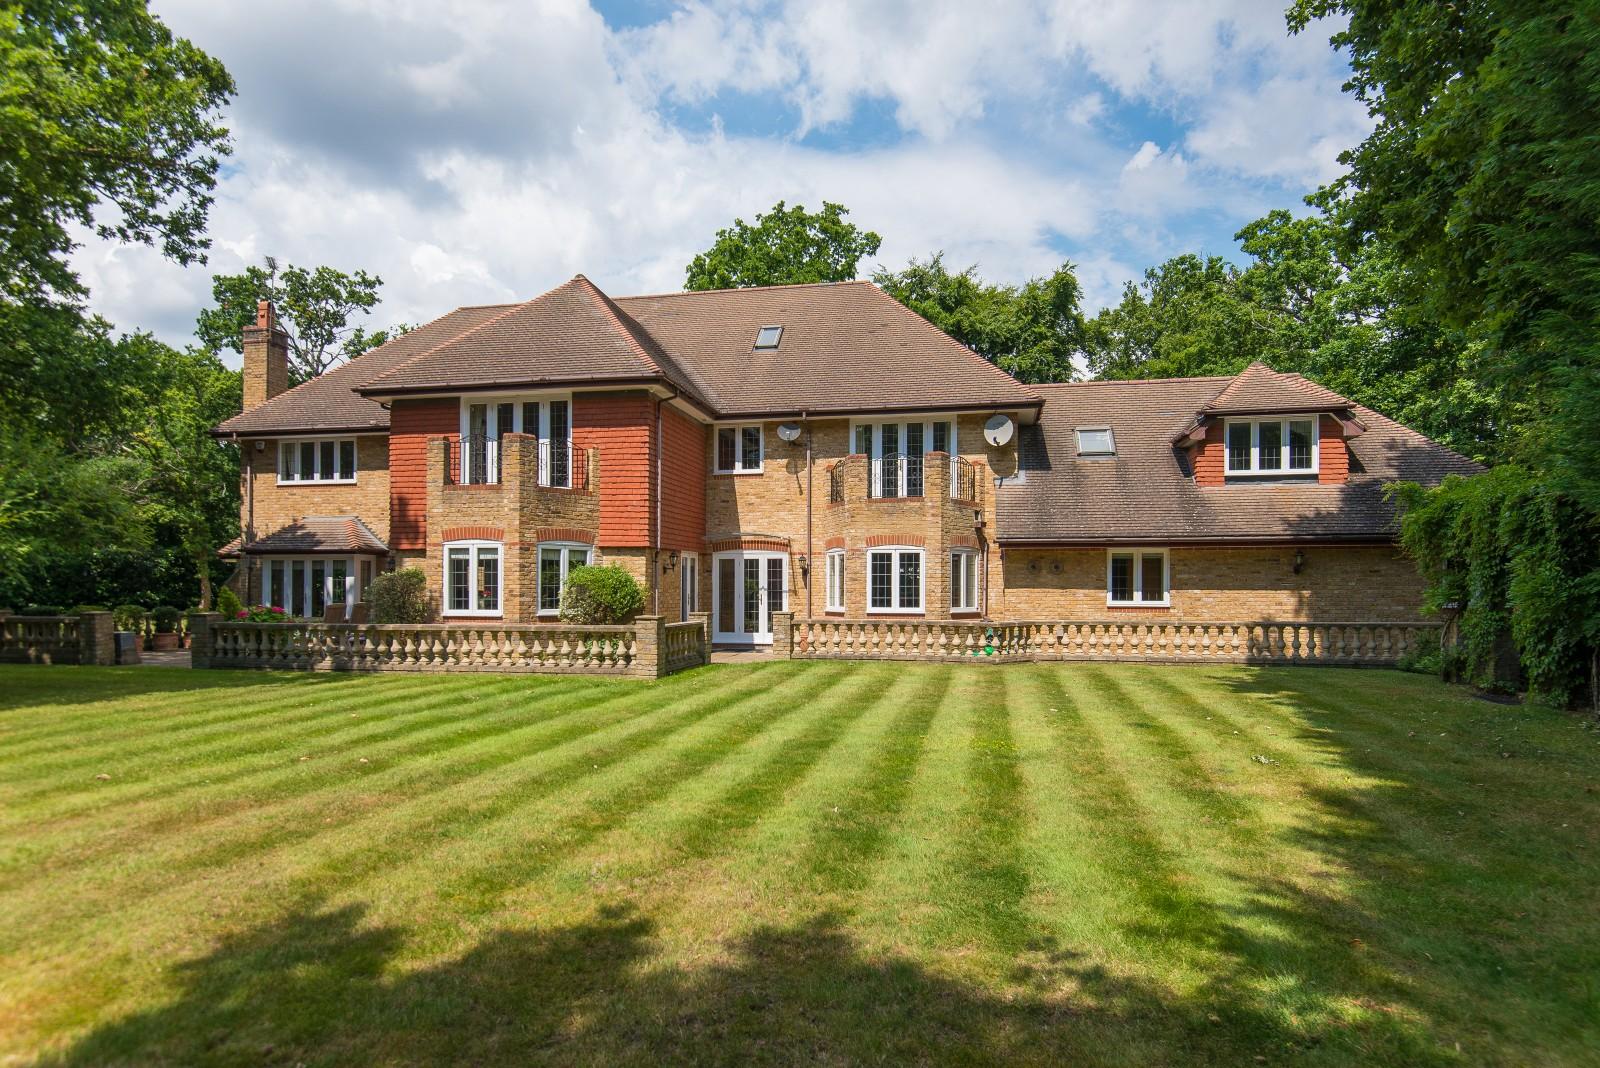 Villa per Affitto alle ore Dukes Kiln Drive, Gerrards Cross, SL9 Gerrards Cross, Inghilterra